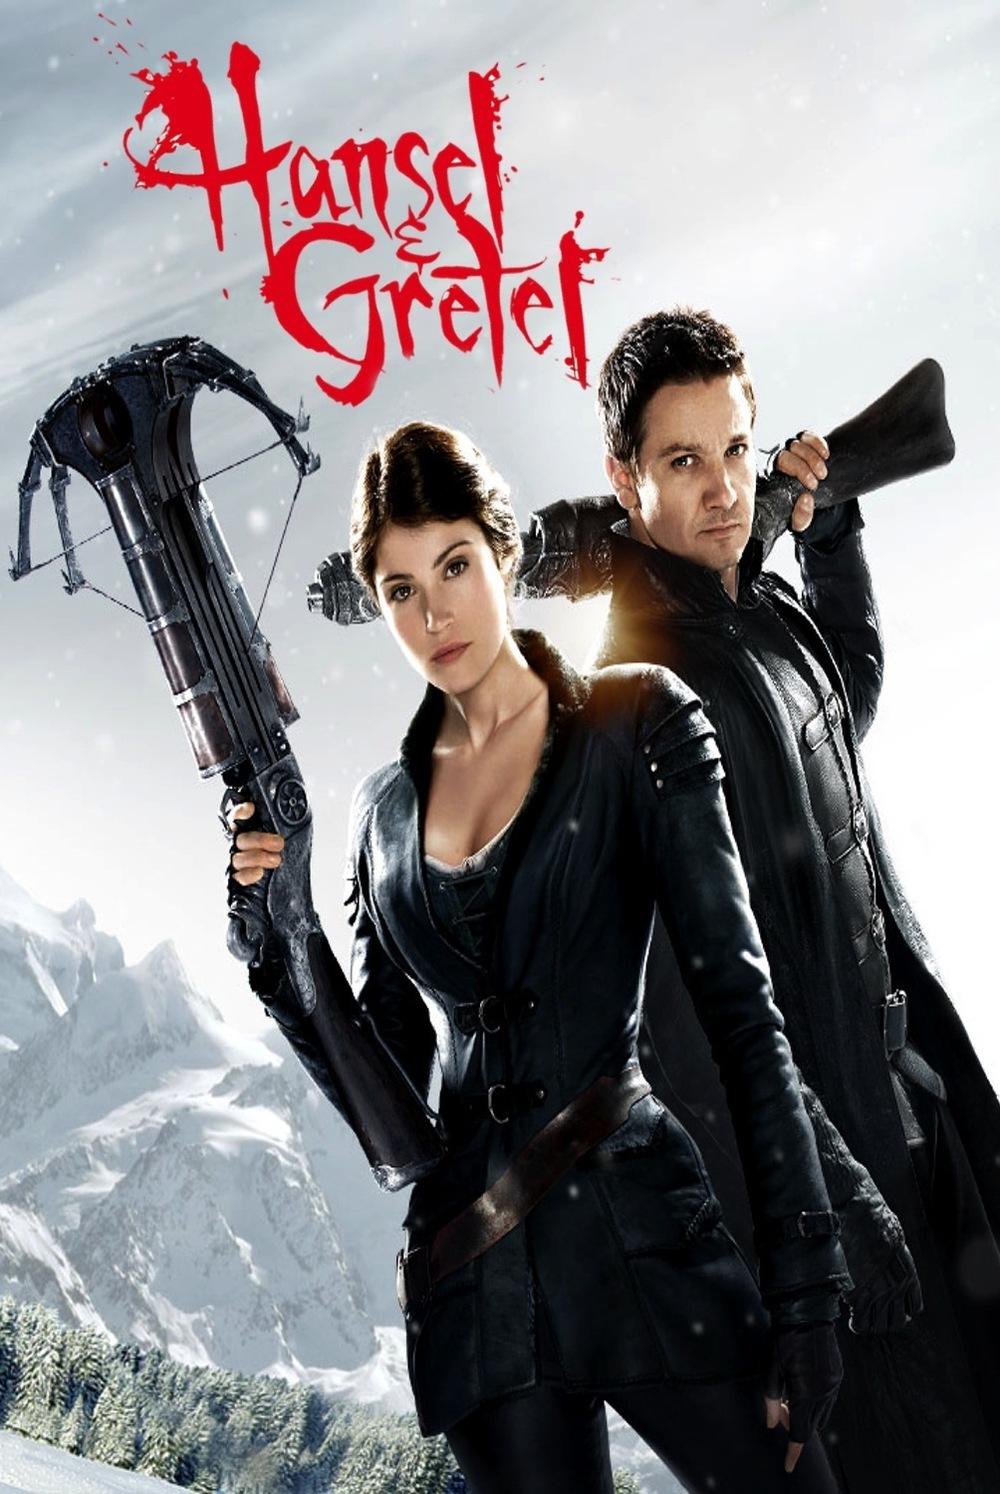 Hansel & Gretel: Witch Hunters [DVD] [2013] - Best Buy